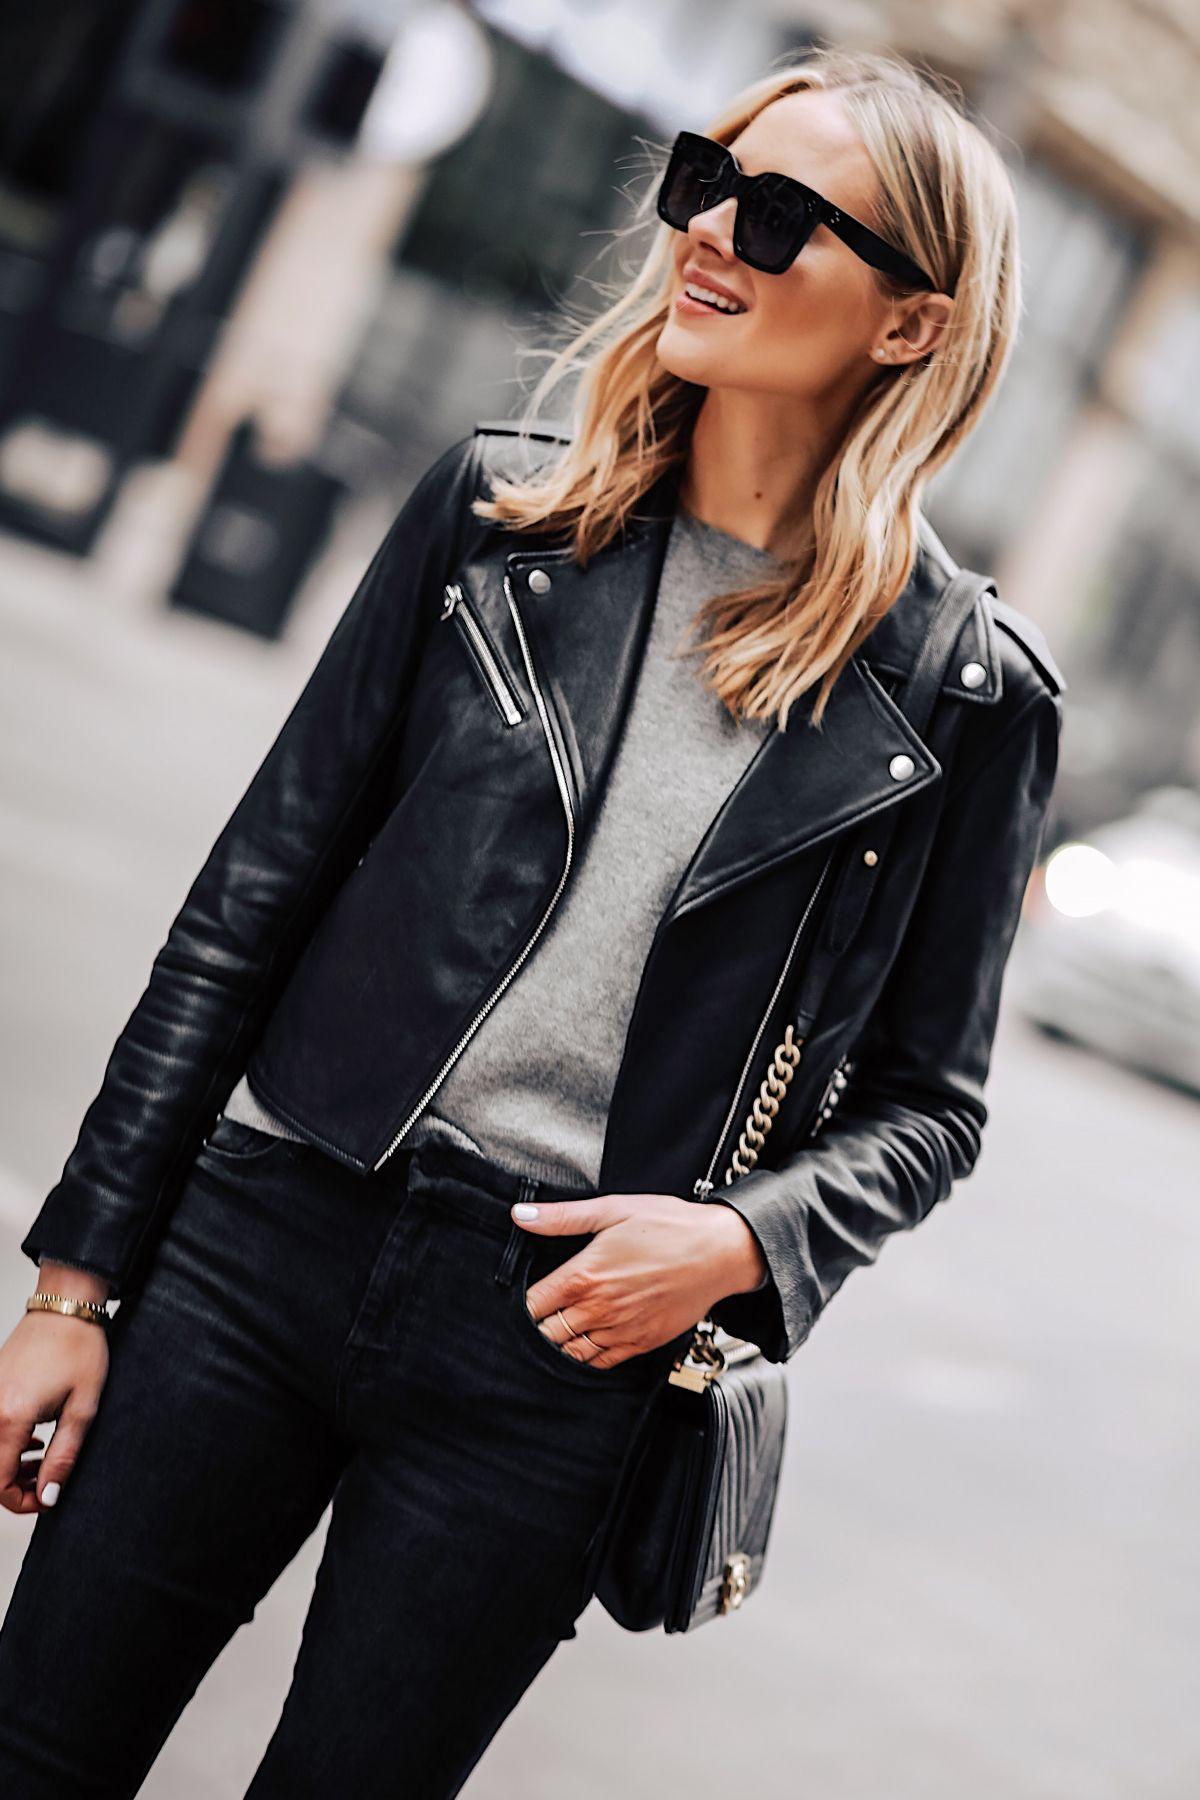 bf1bffb577a Blonde Woman Wearing Club Monaco Black Leather Jacket Grey Sweater Black  Skinny Jeans Fashion Jackson San Diego Fashion Blogger Street Style